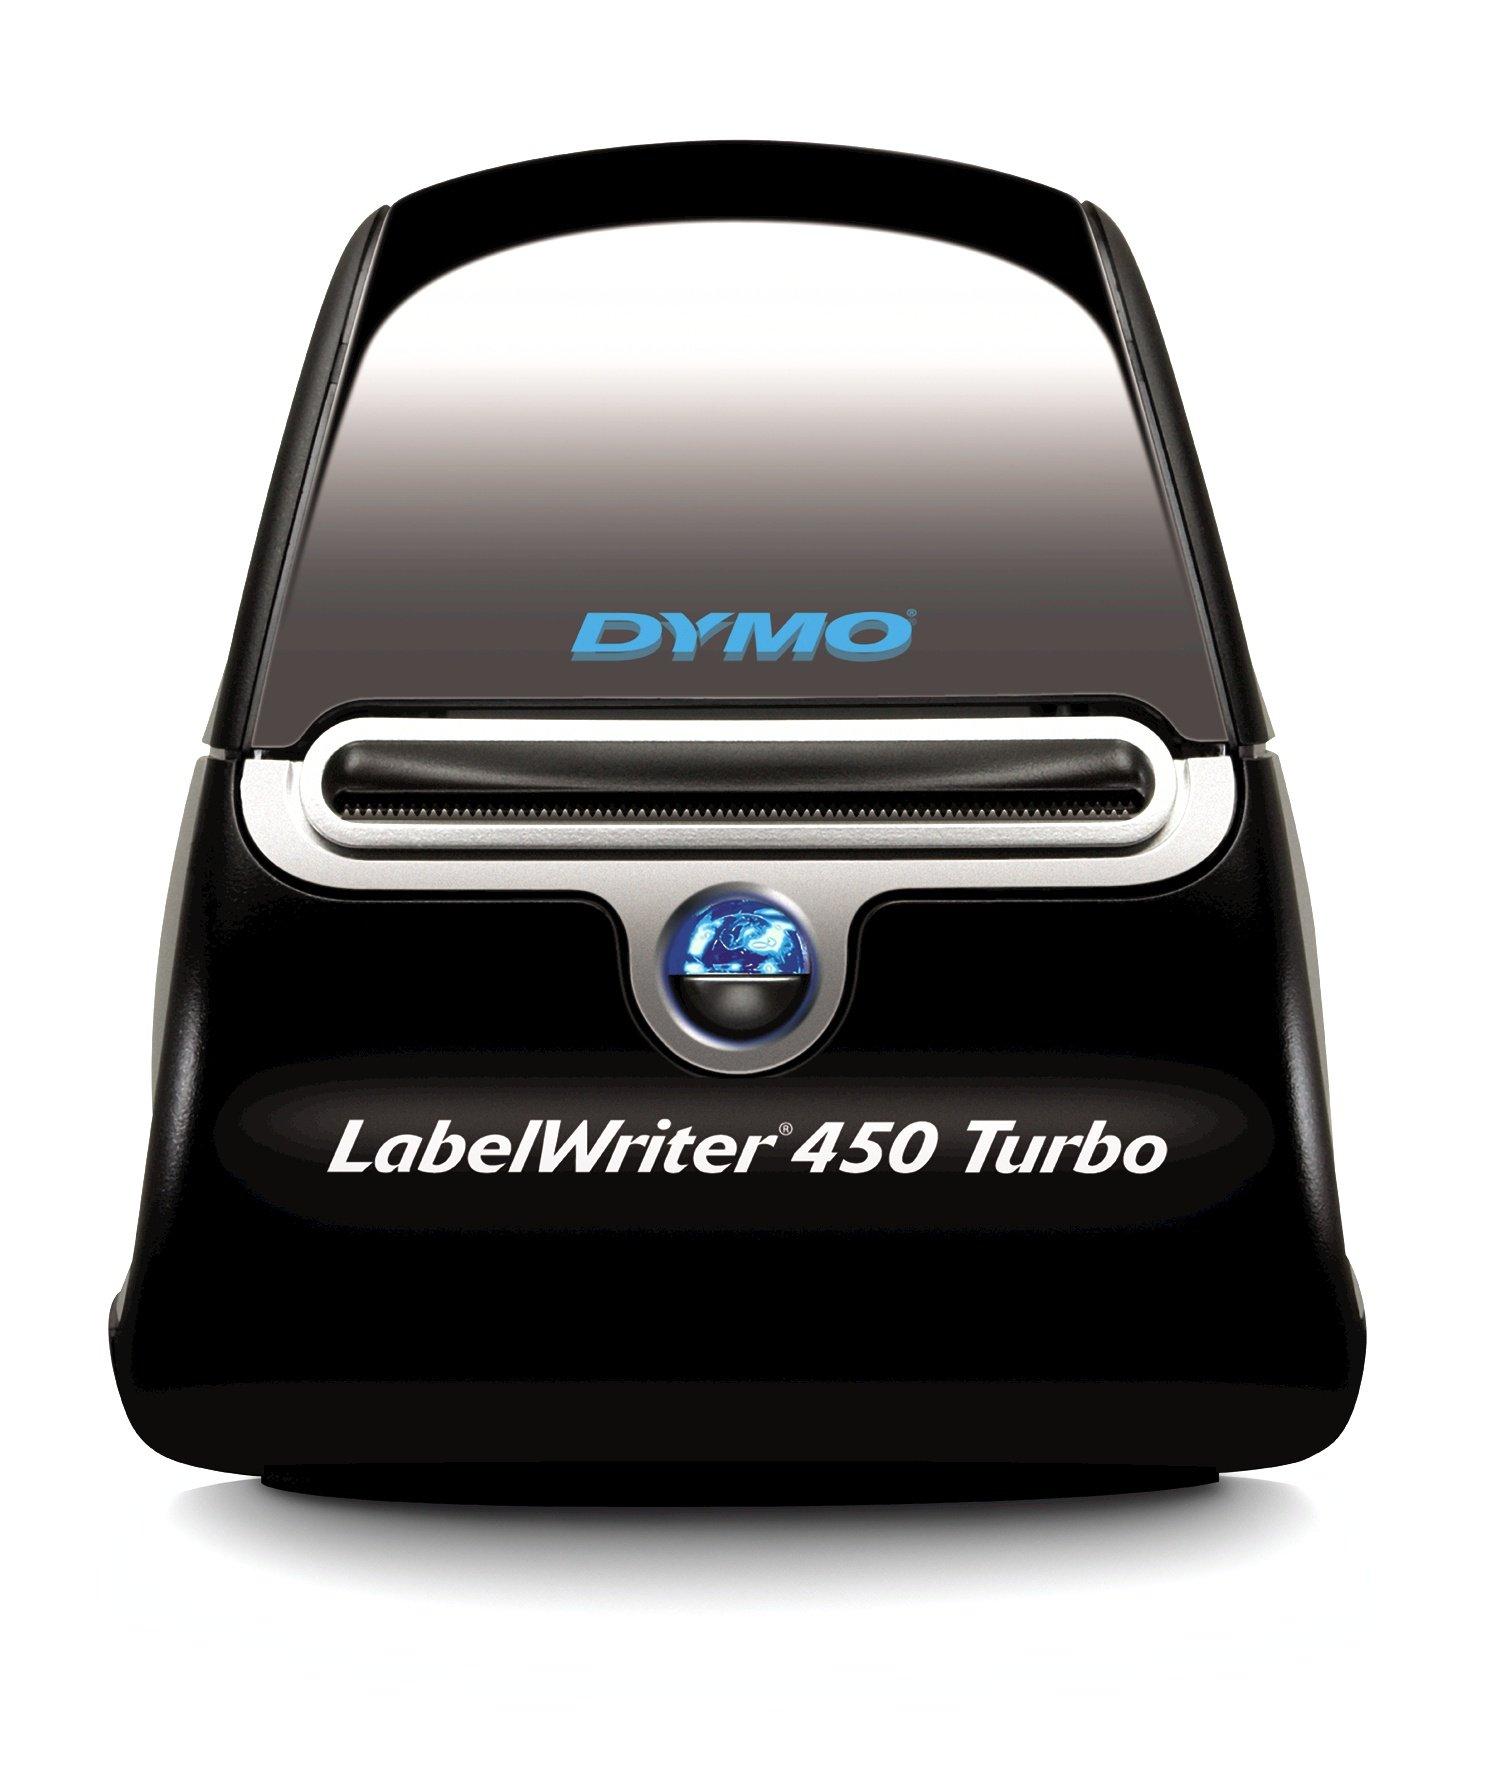 DYM1752265 - Dymo LabelWriter 450 Turbo Direct Thermal Printer - Monochrome - Label Print